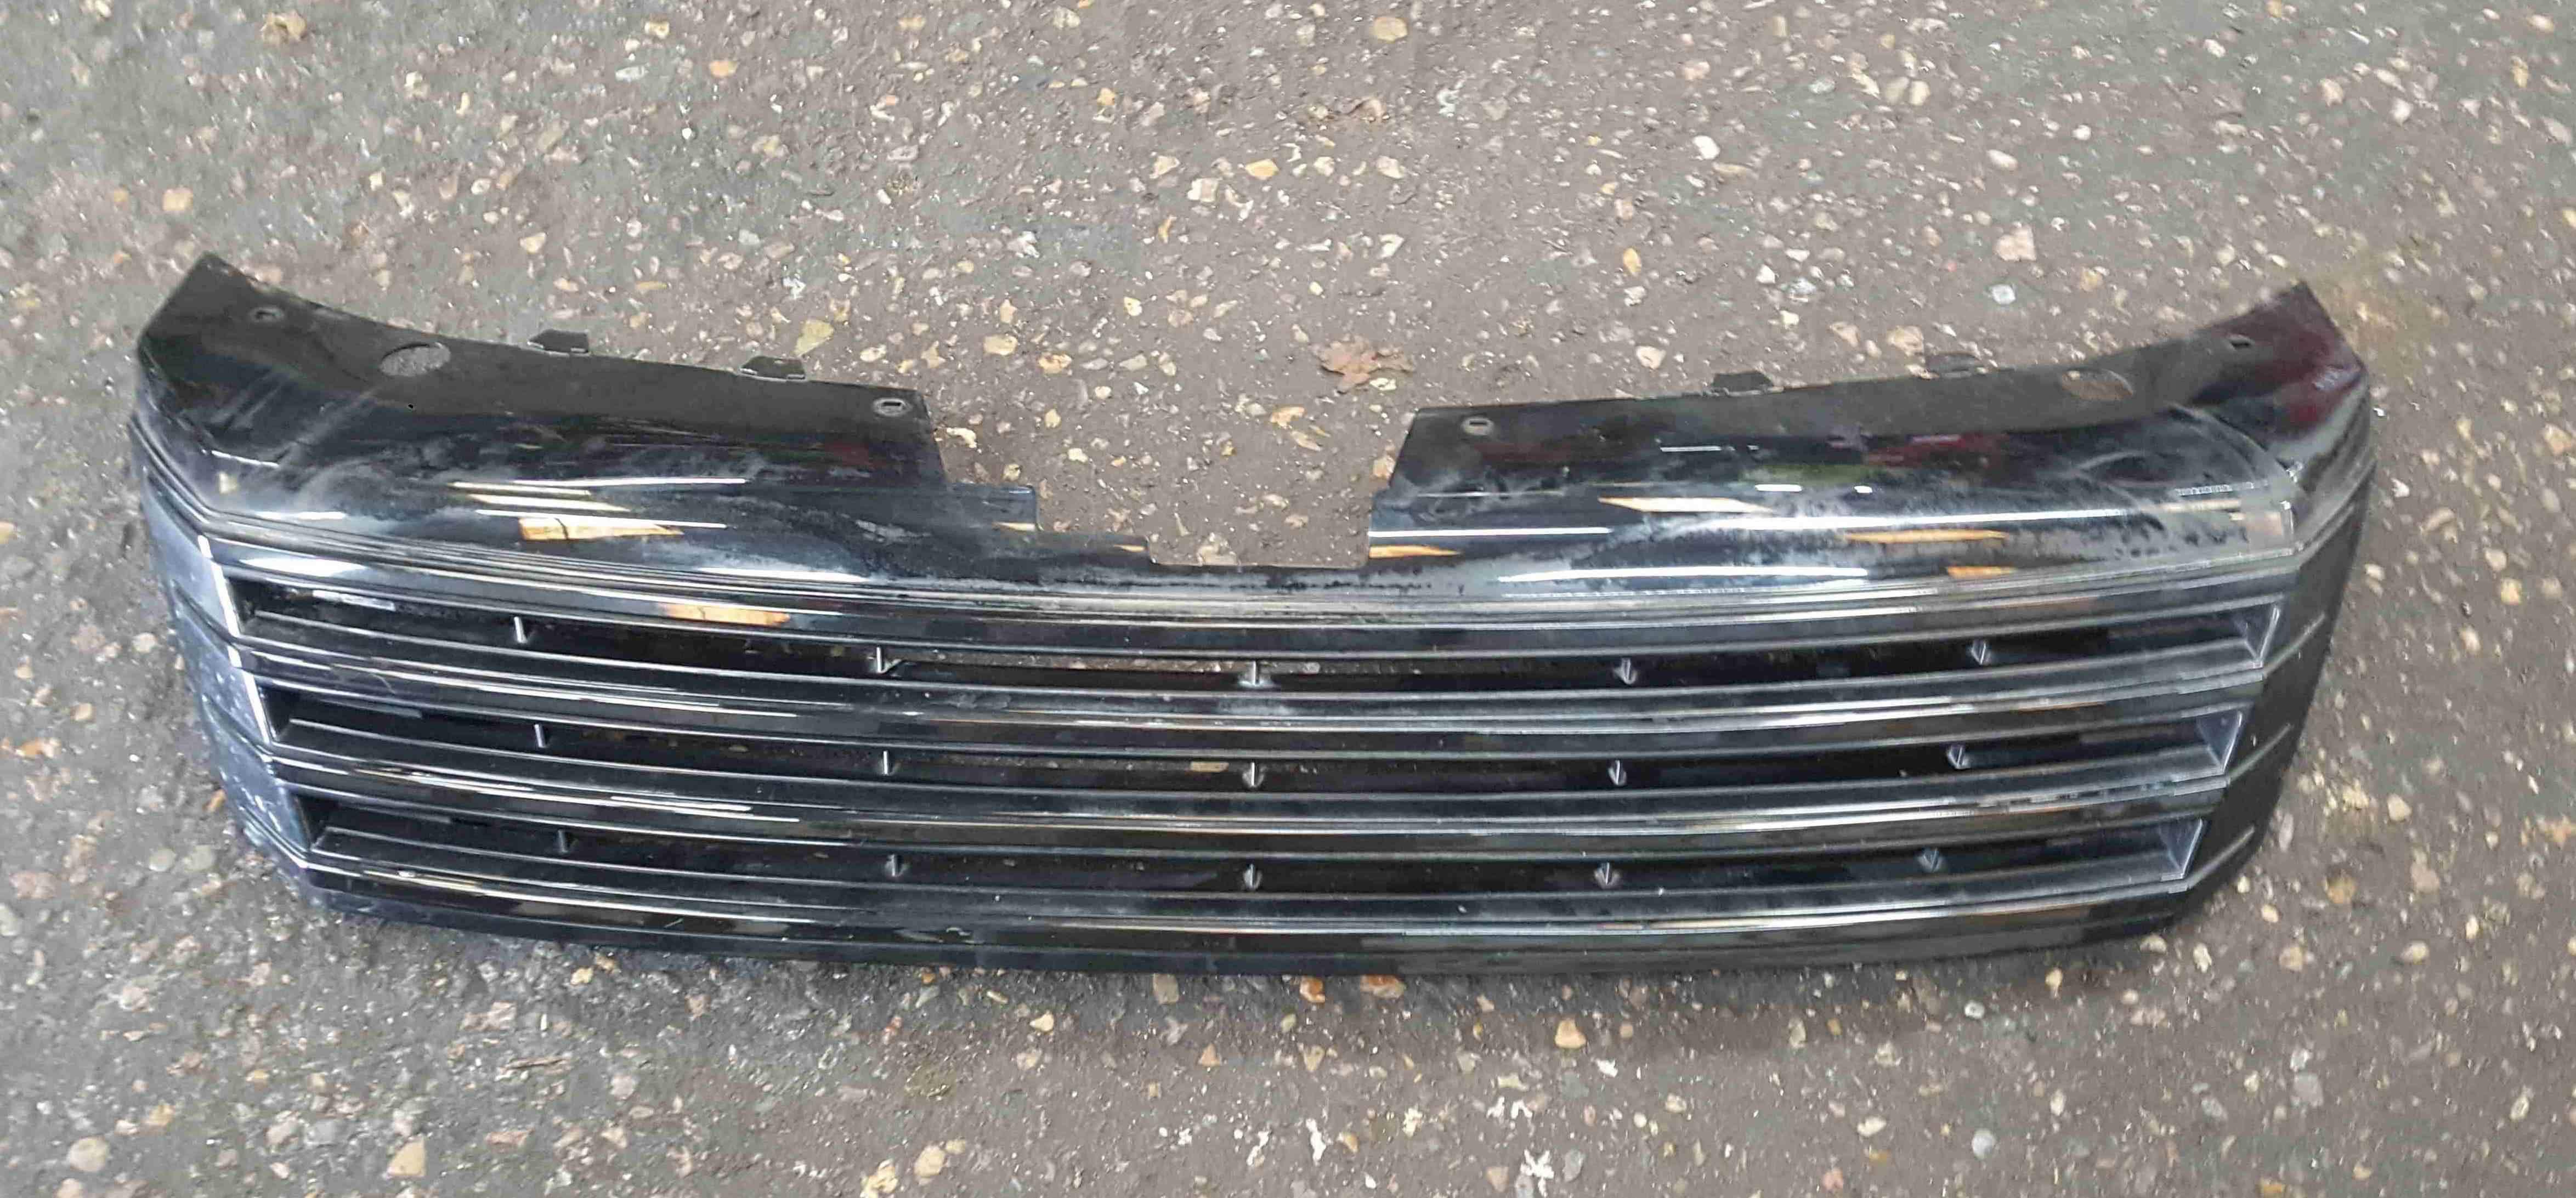 Volkswagen Passat B7 2010-2015 Front Bumper Grill Insert Black